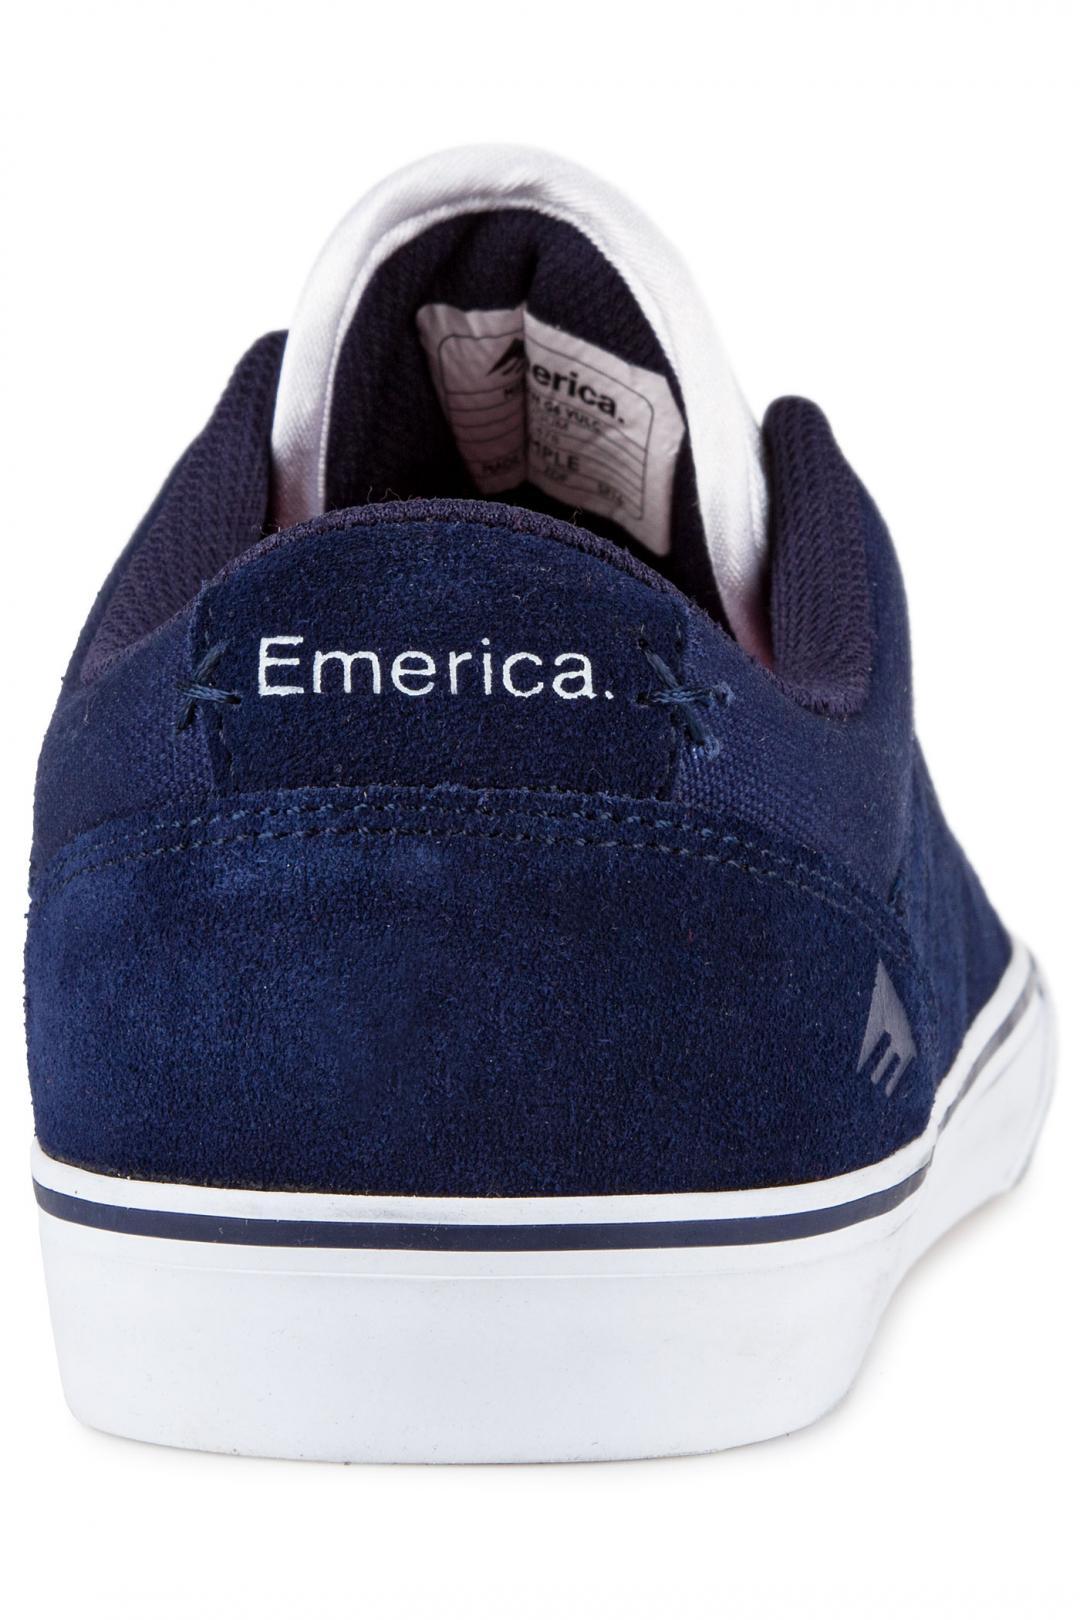 Uomo Emerica The Herman G6 Vulc navy white gum | Sneaker